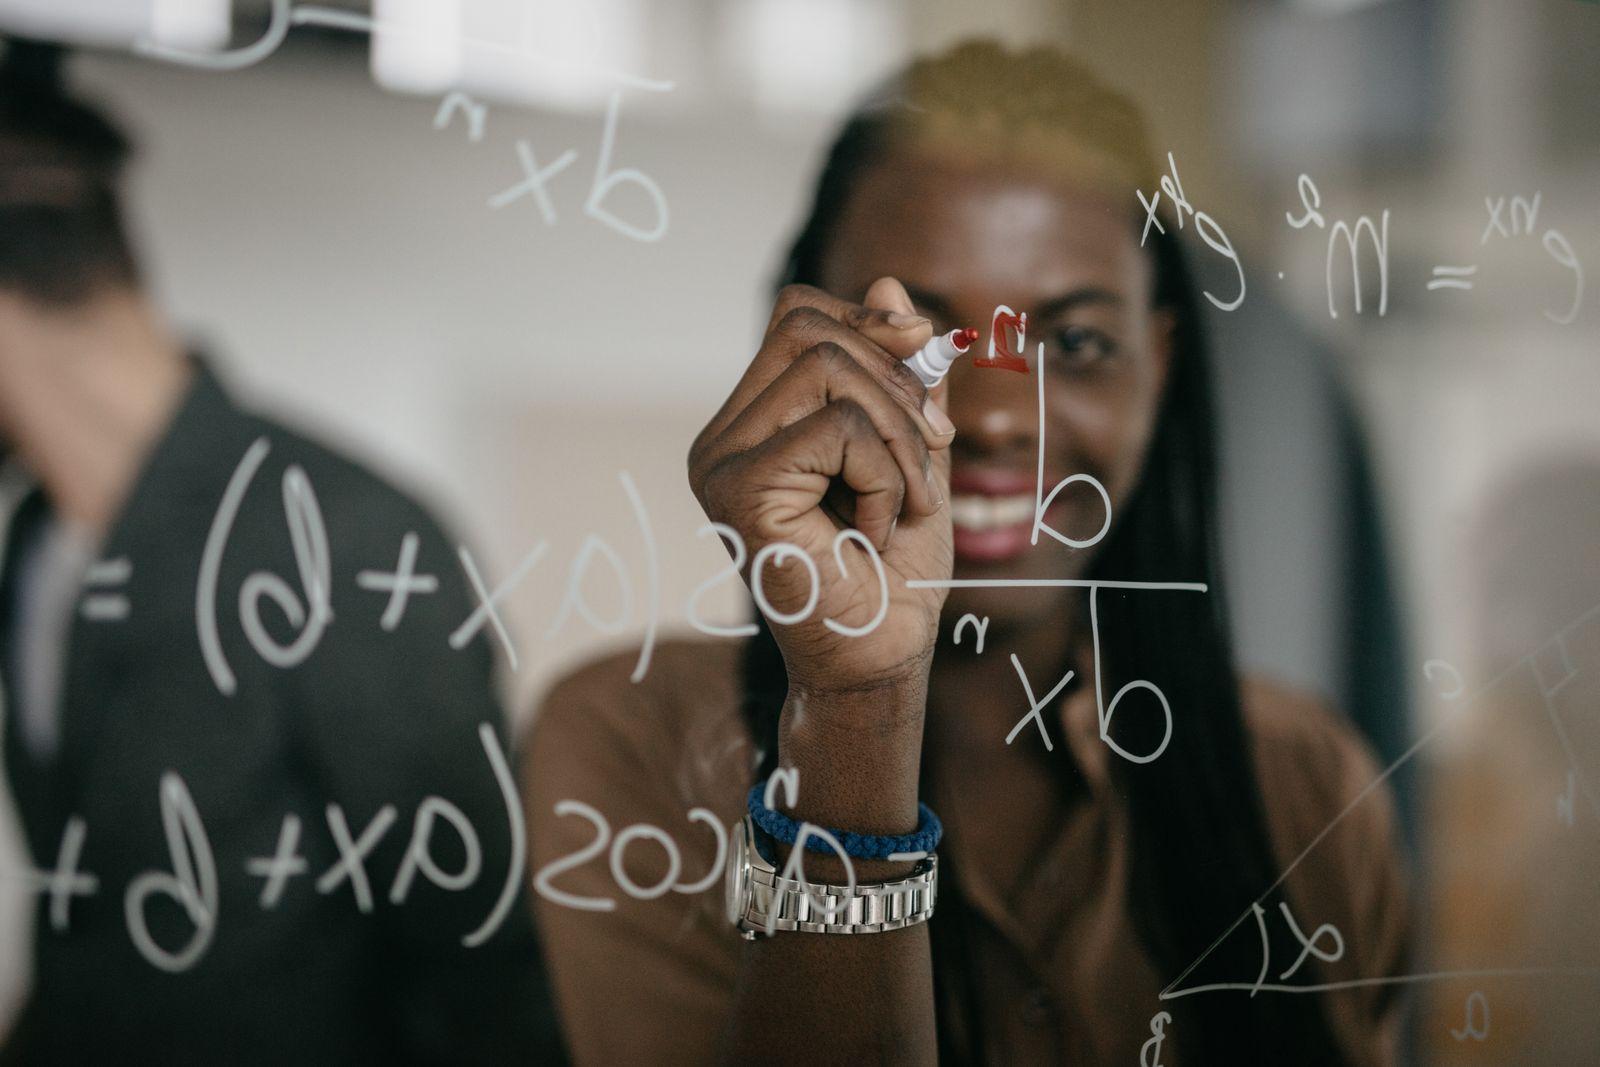 Professor Writing Mathematical Formulas on a glass